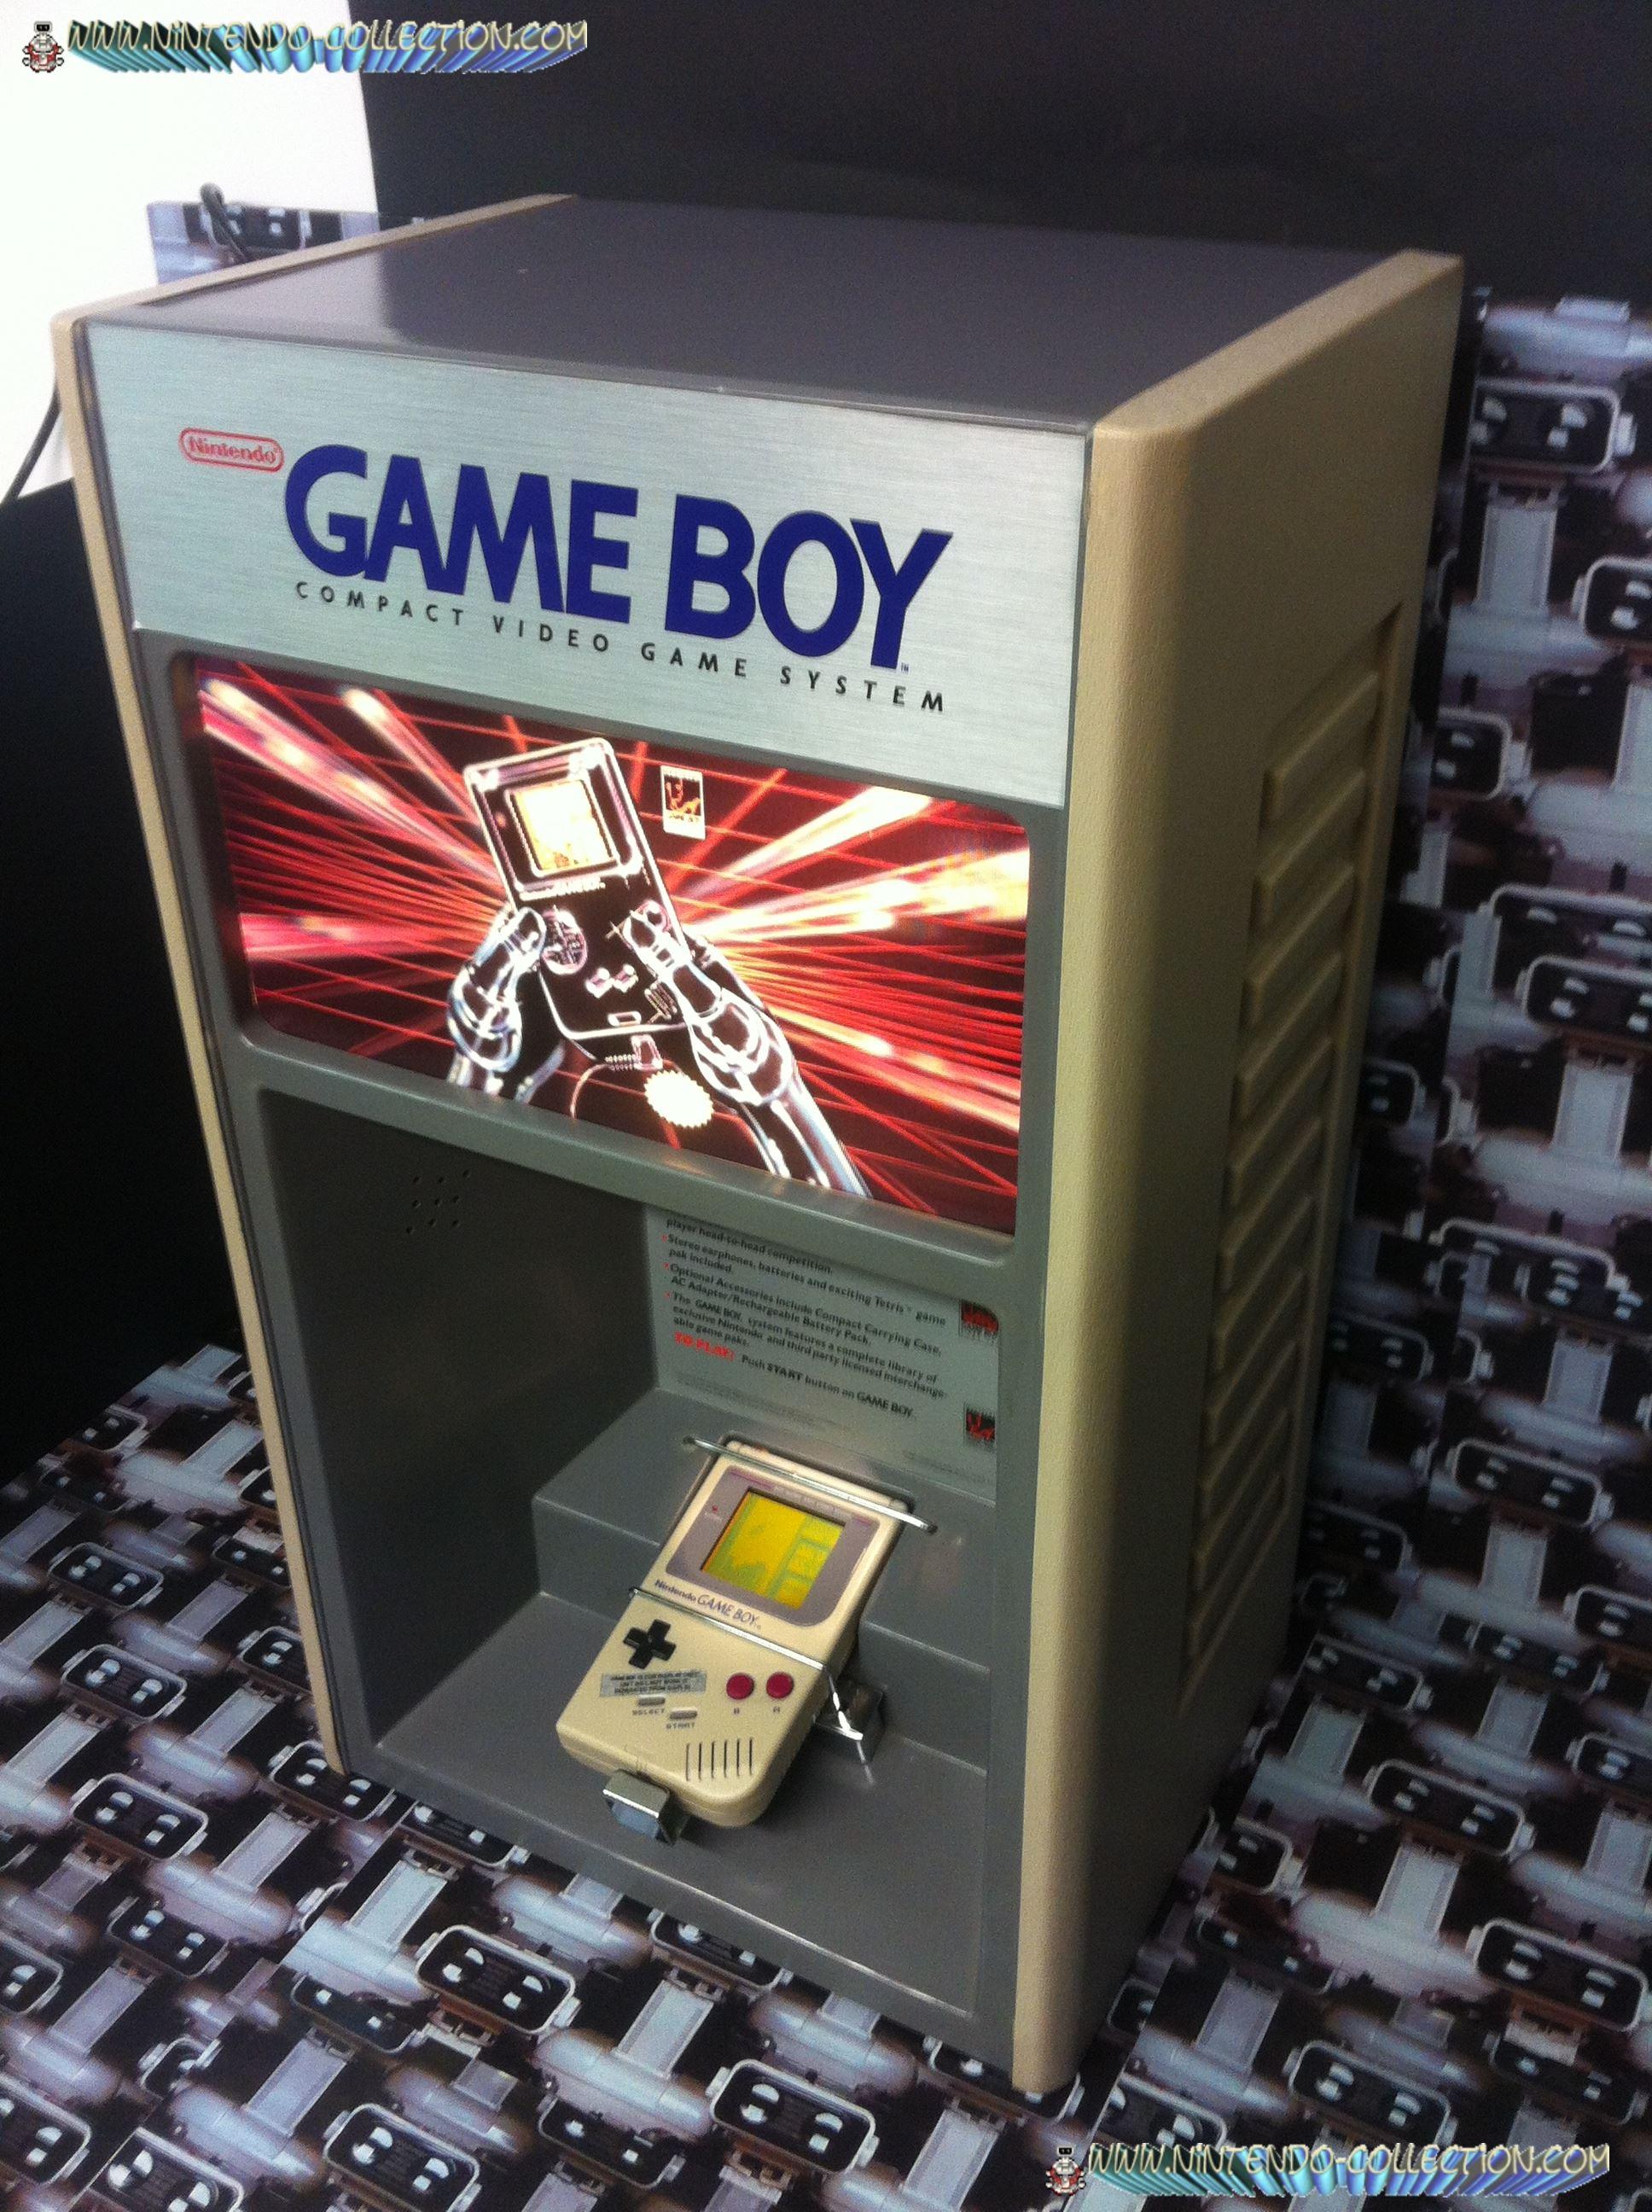 www.nintendo-collection.com - Borne demonstration Gameboy Demo Kiosk - 3